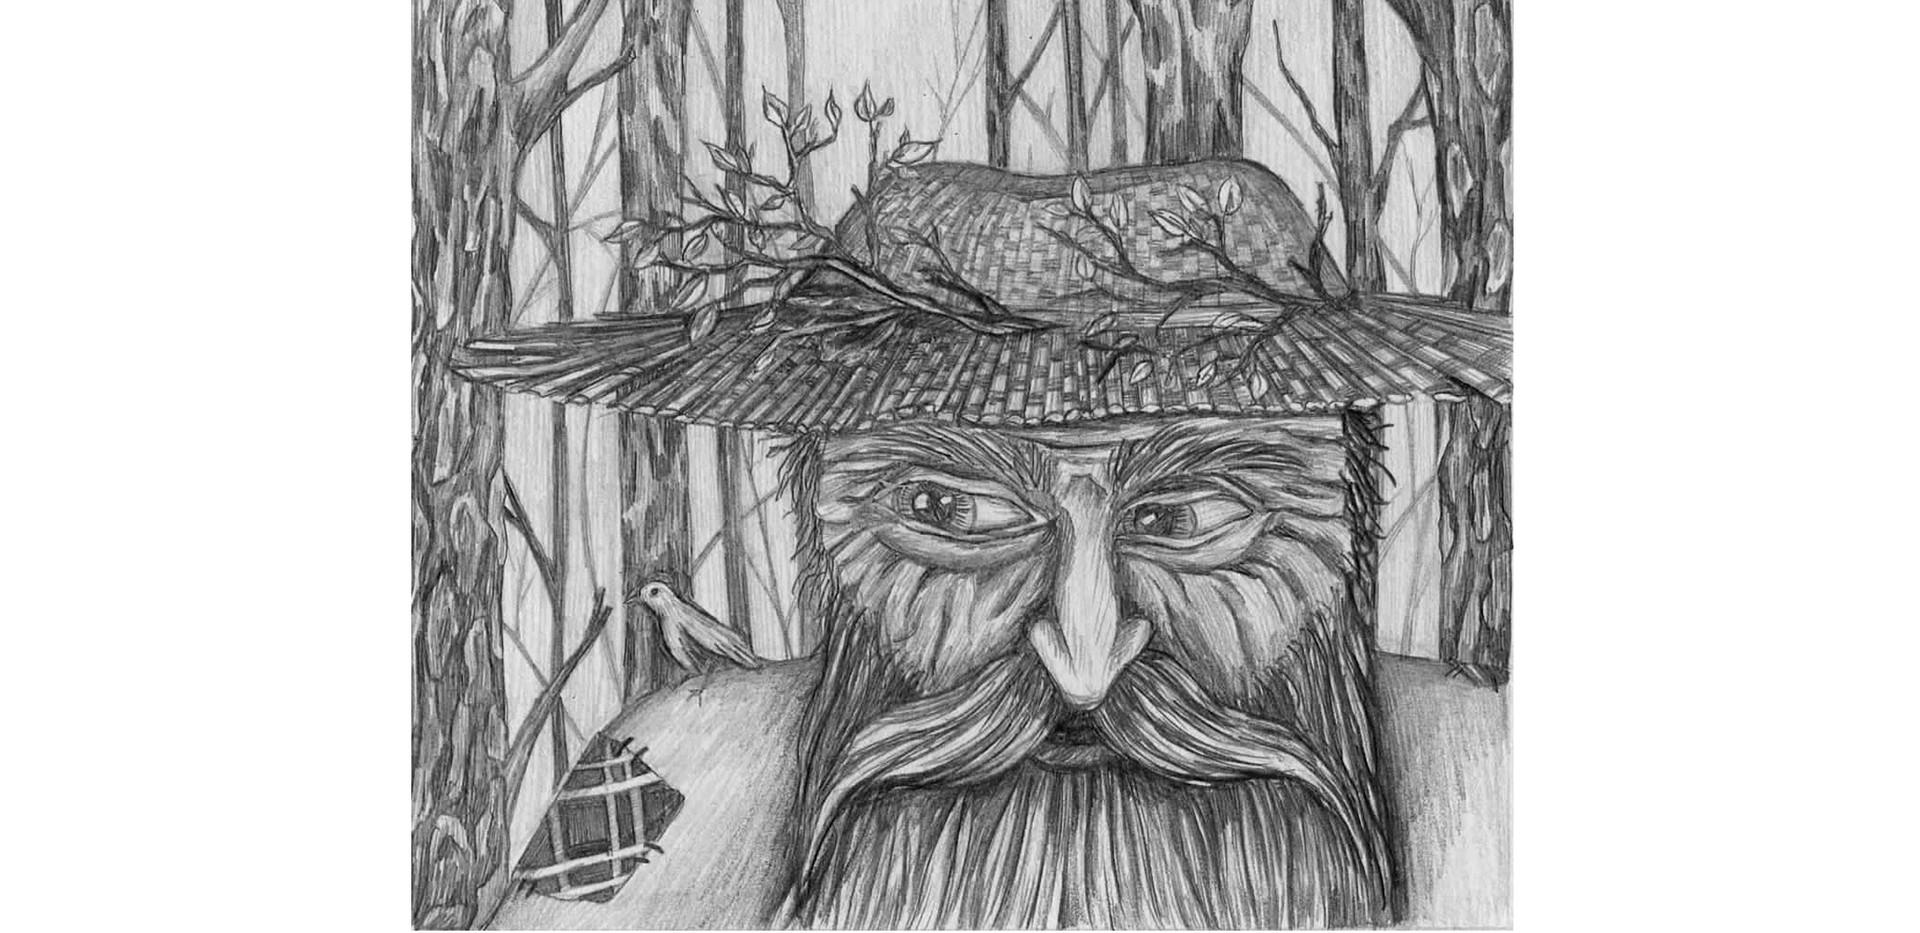 Folklore character- Leshy